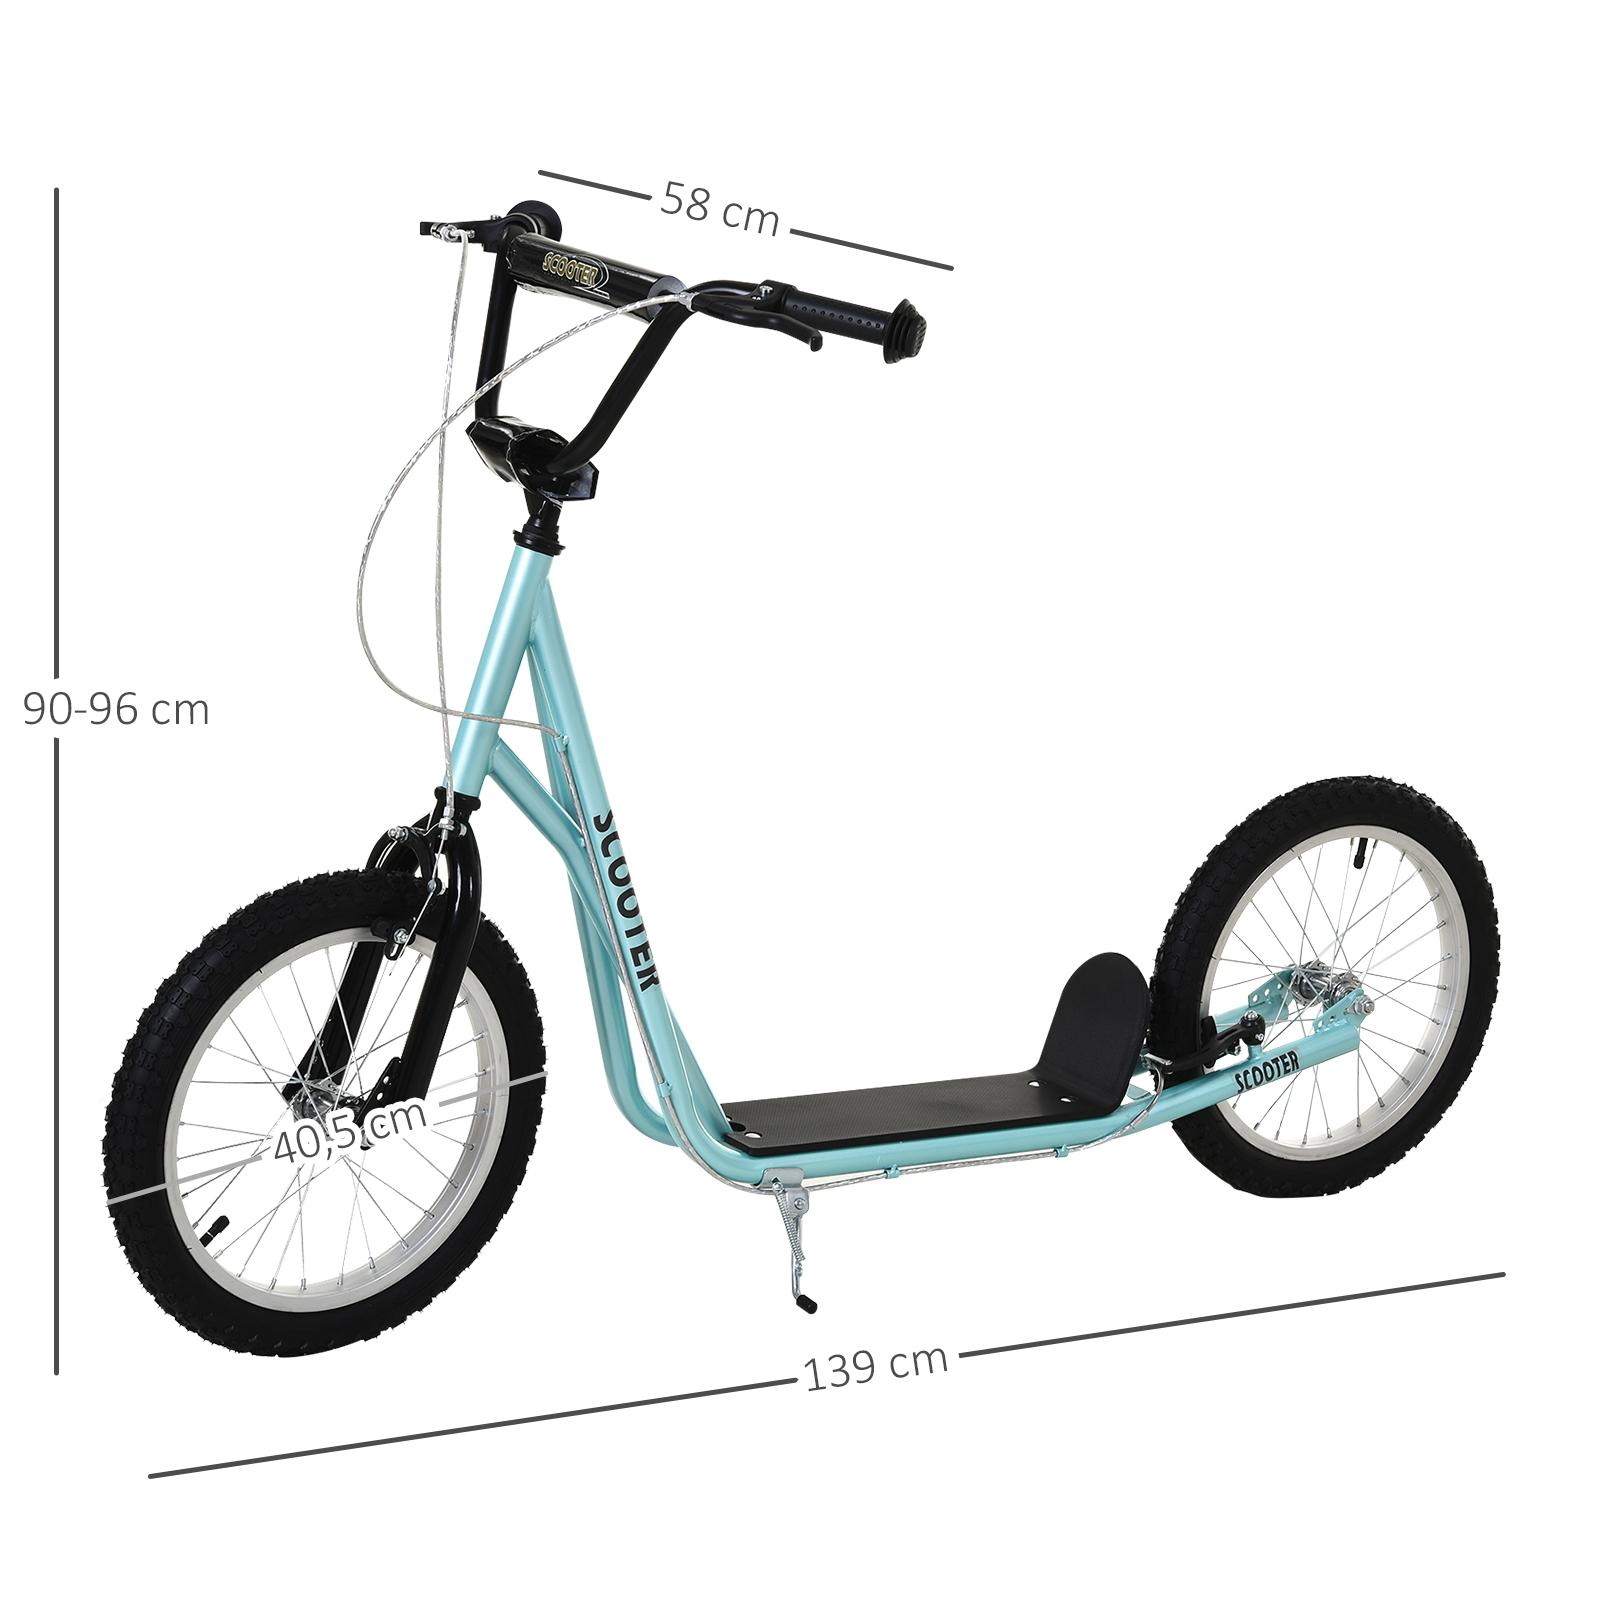 Indexbild 13 - HOMCOM-Tretroller-Kinderroller-Scooter-Cityroller-Roller-verstellbar-Blau-Gruen